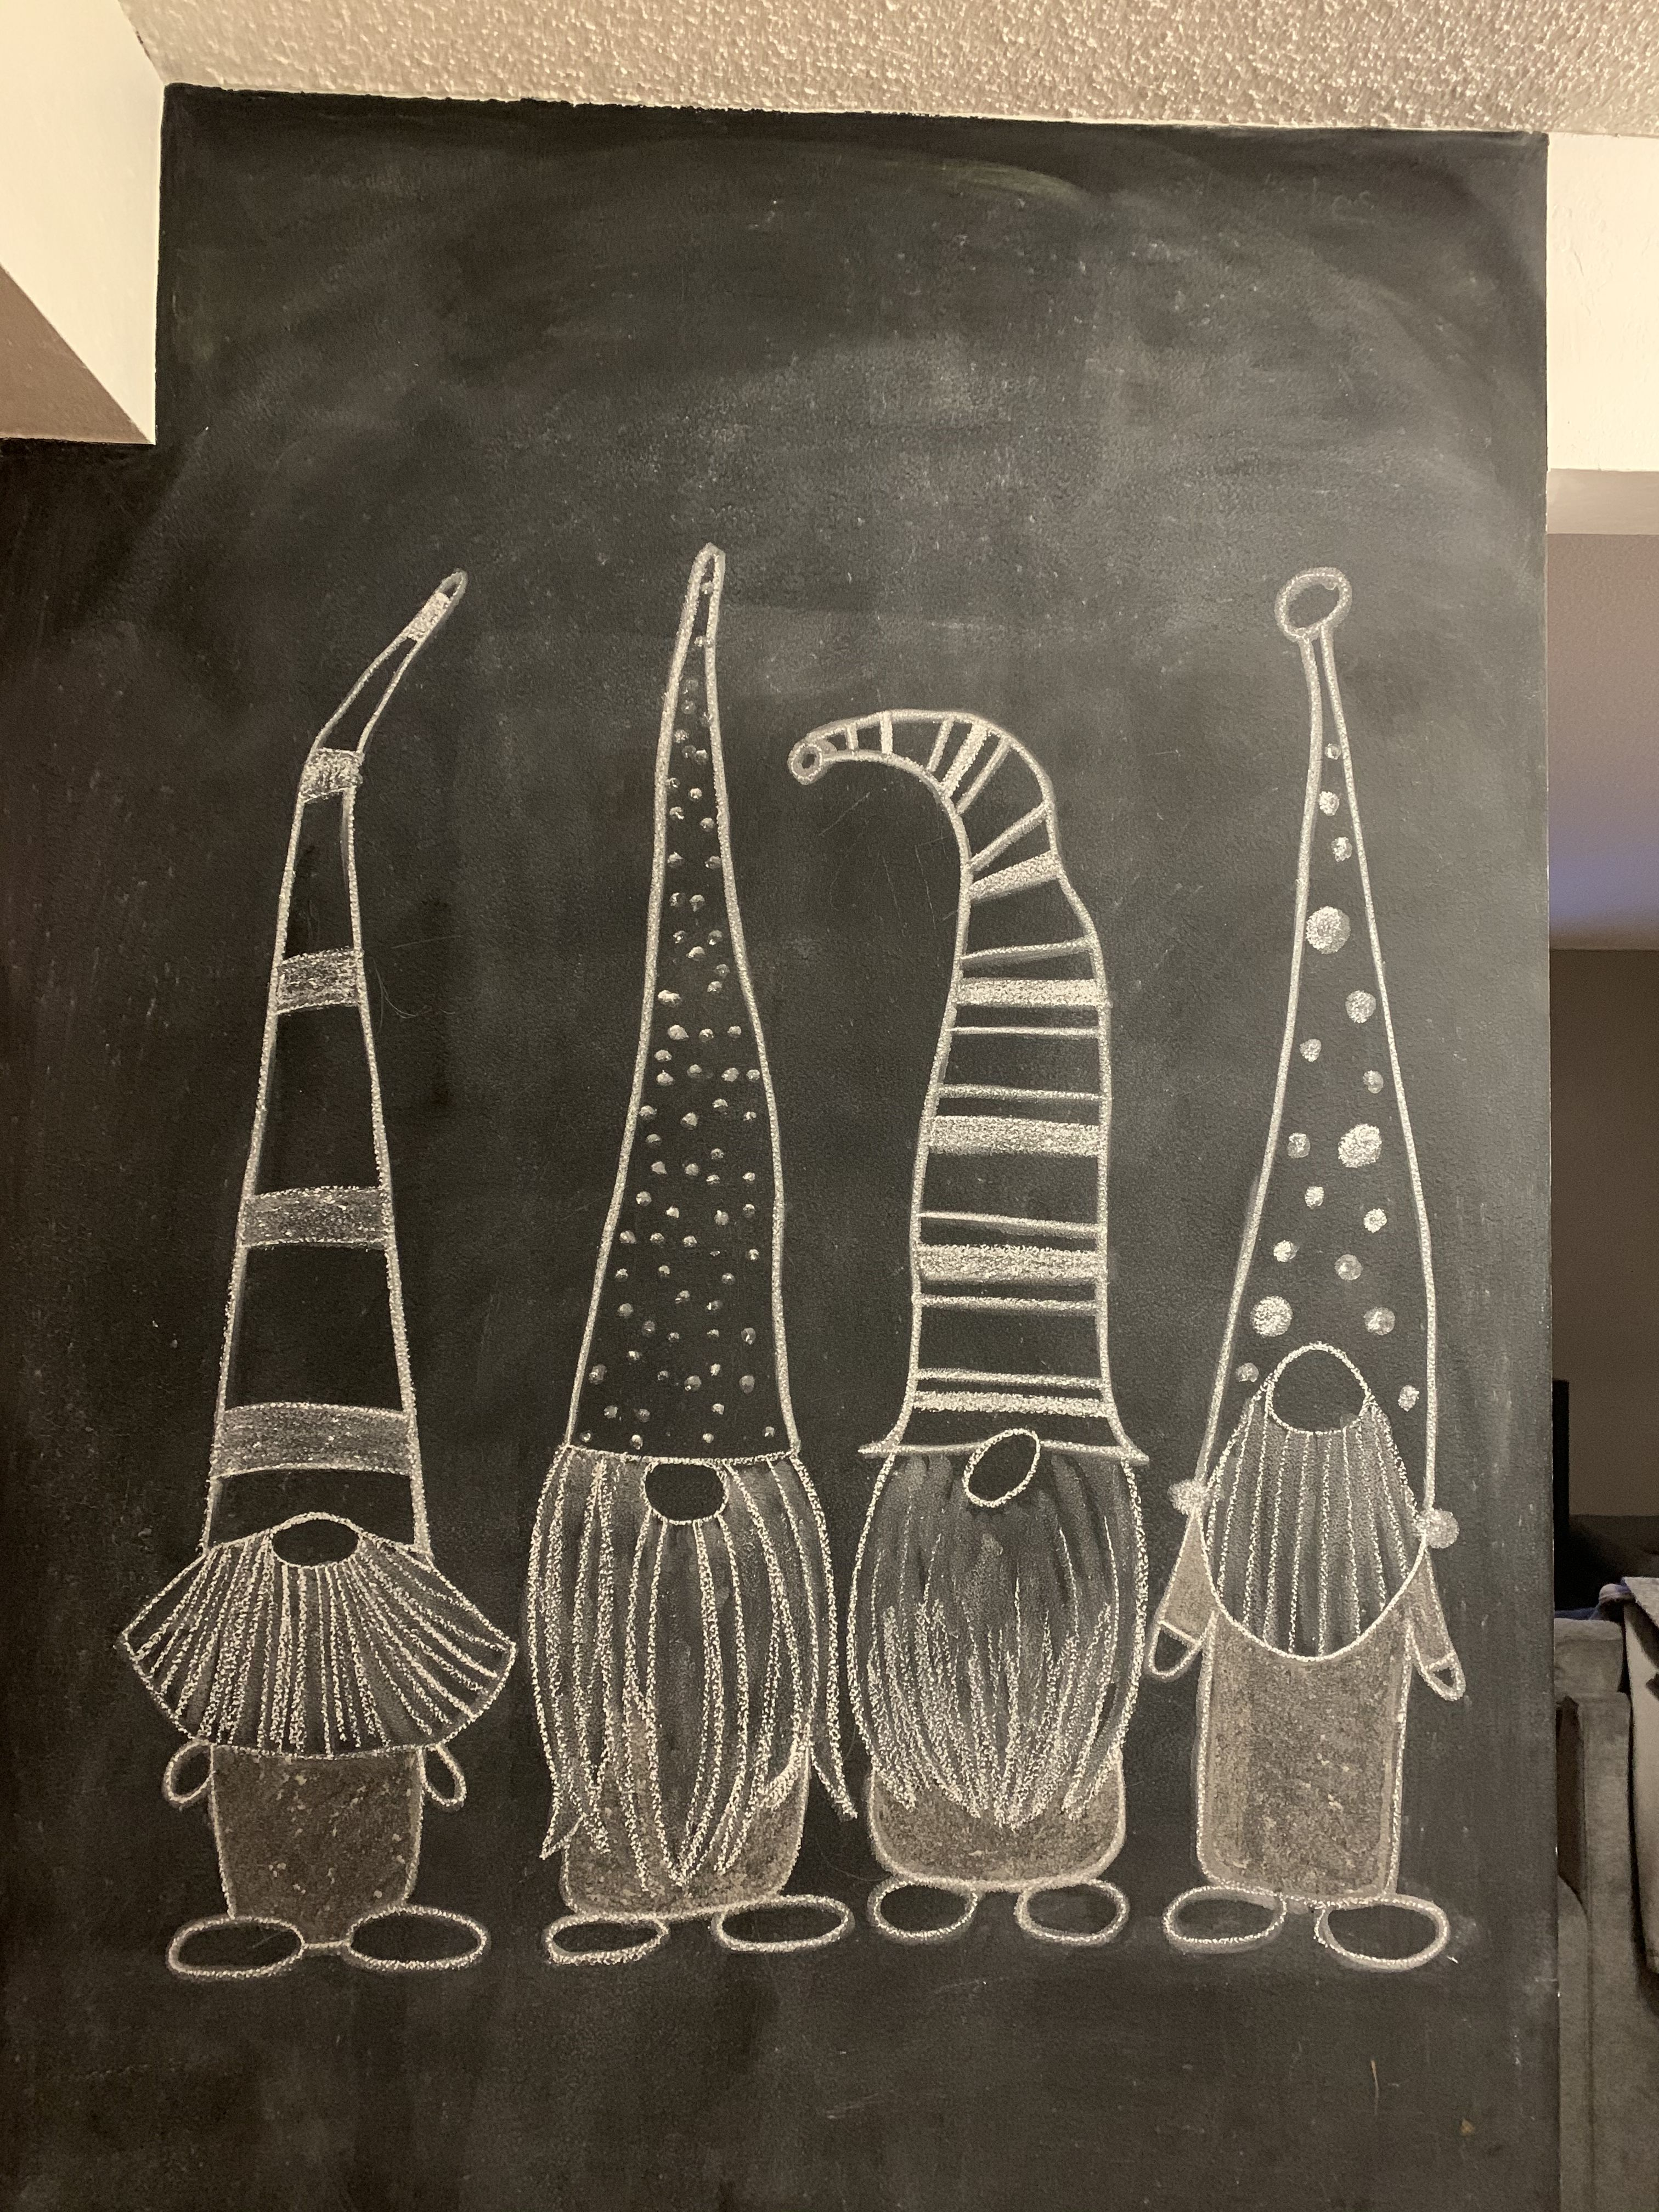 Gnome chalk wall